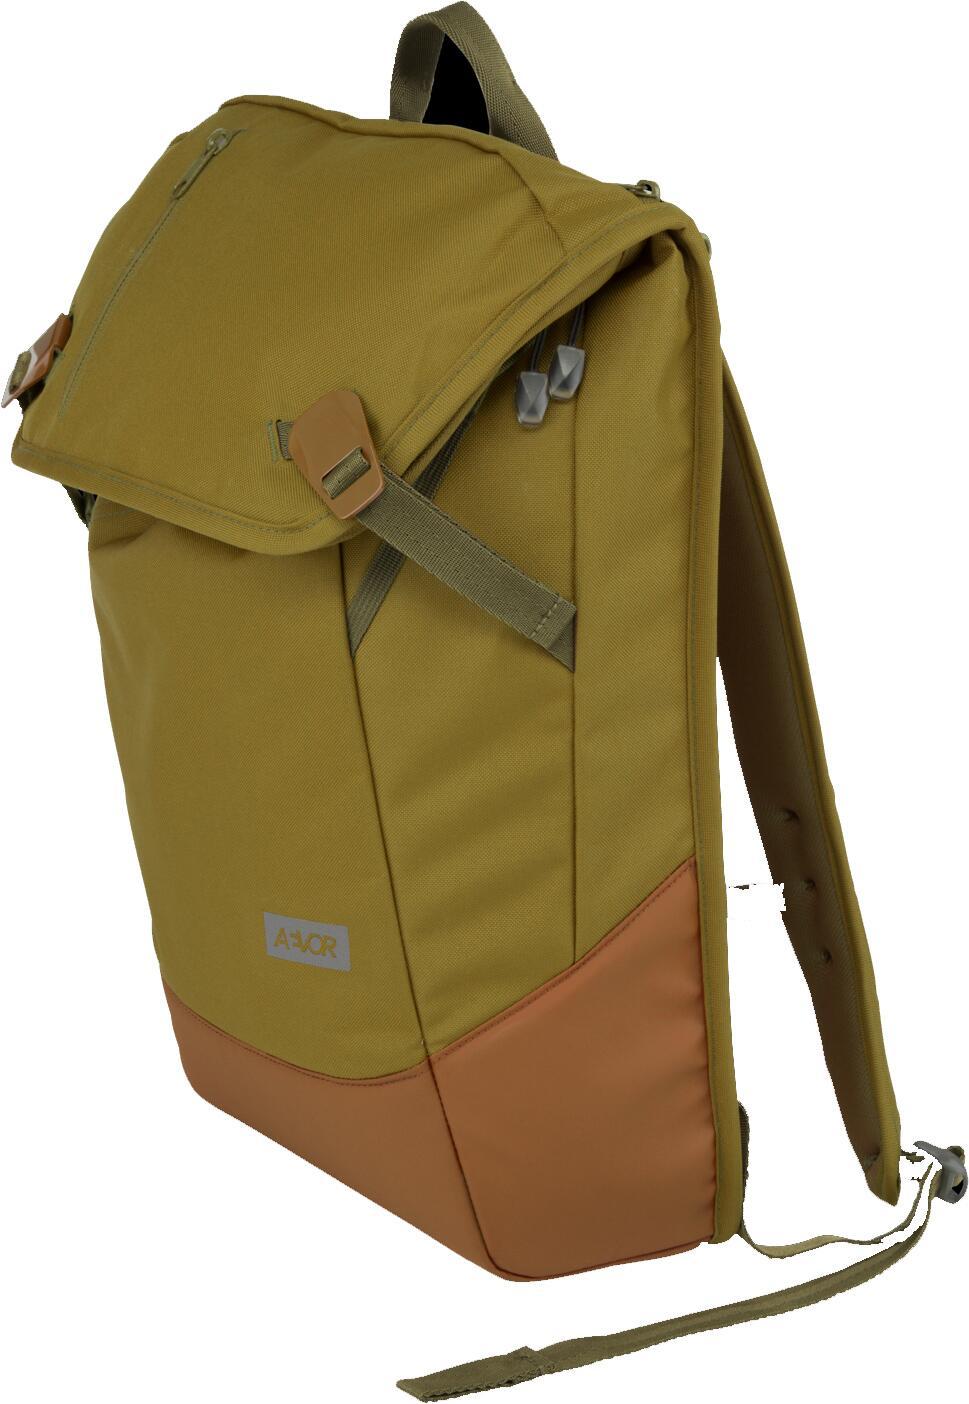 aevor-daypack-woodland-farbe-233-woodland-green-